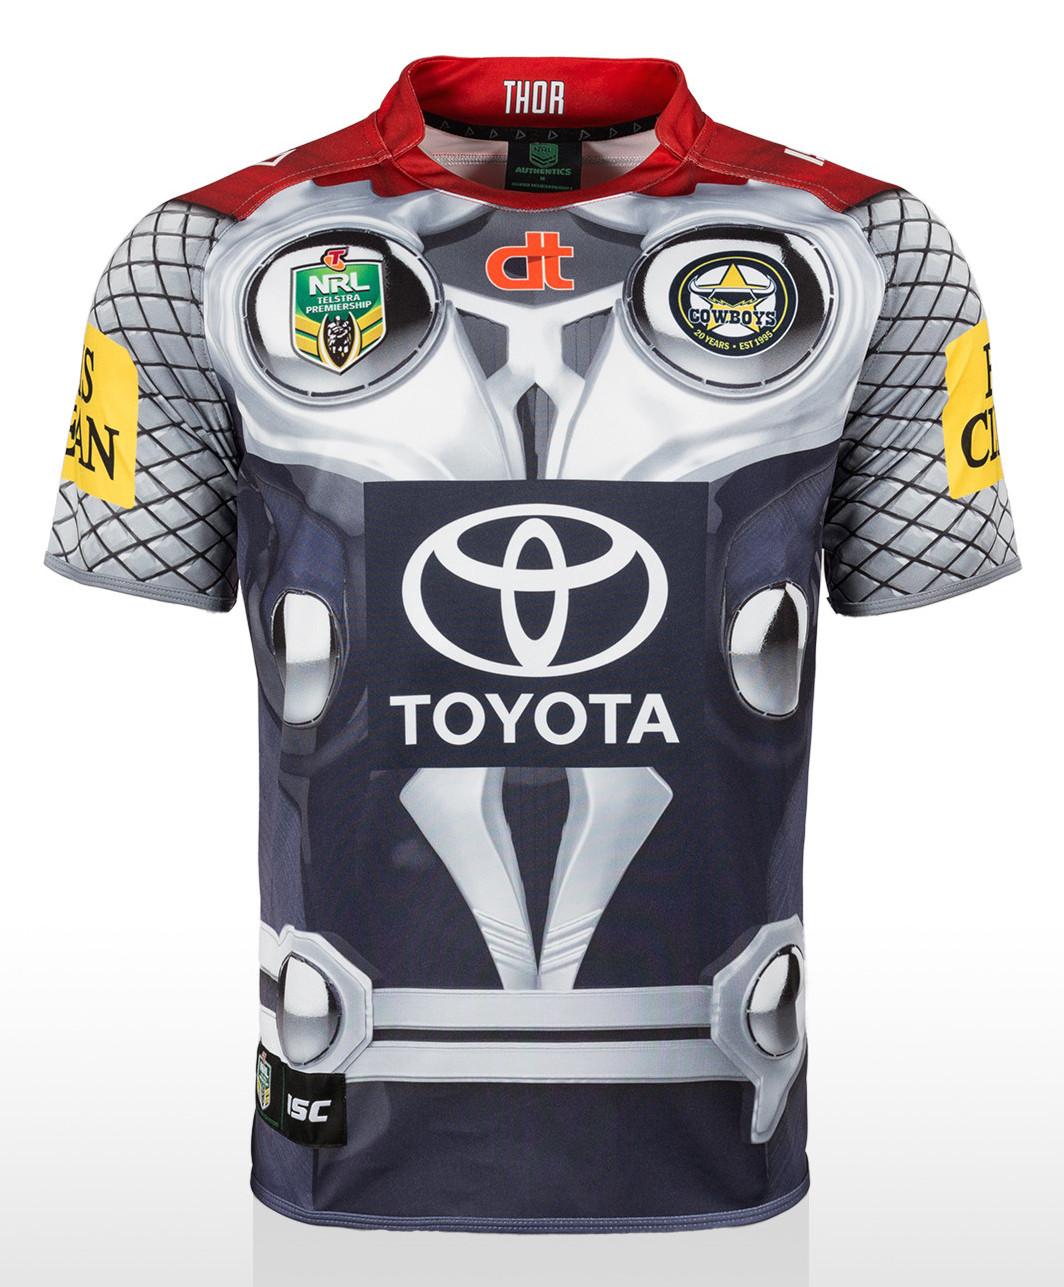 T shirt design qld - North Queensland Cowboys Thor Shirt